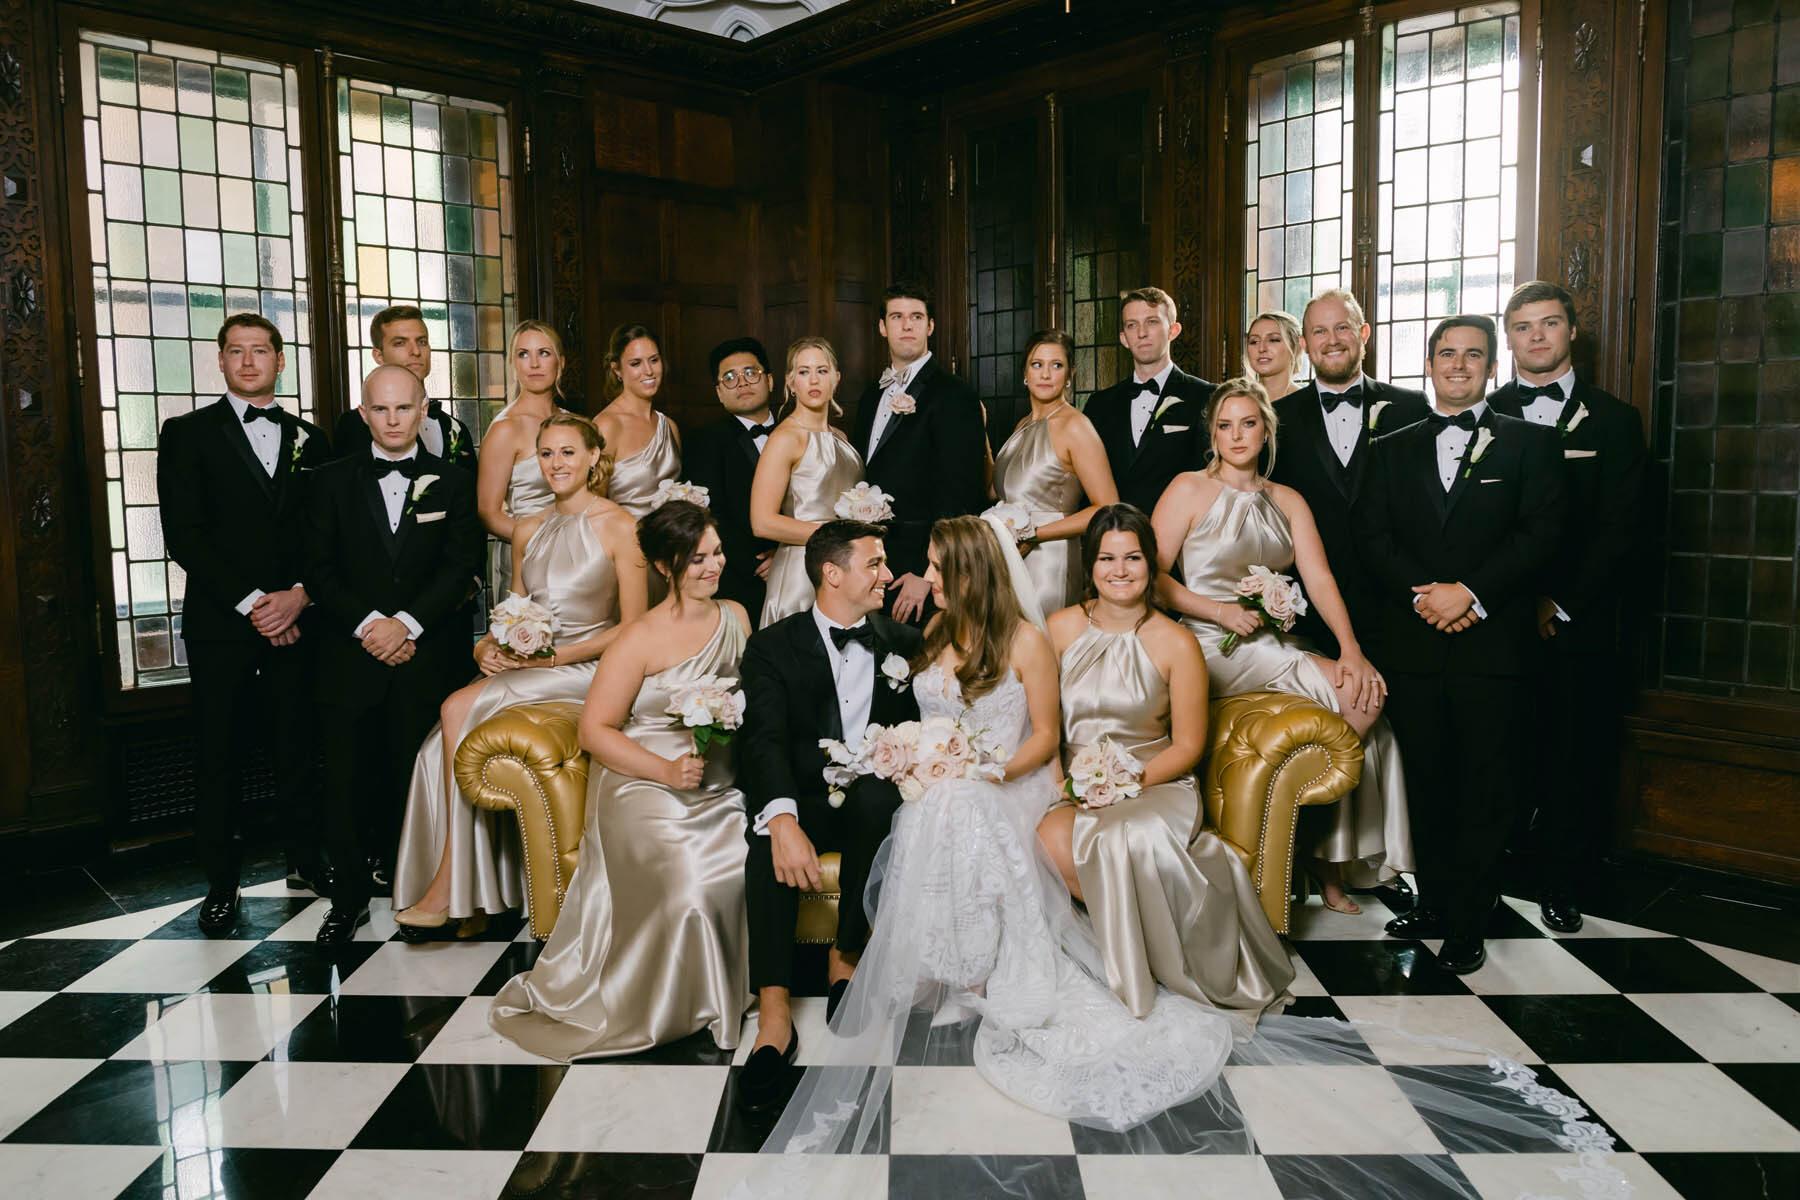 Blackstone Hotel wedding party